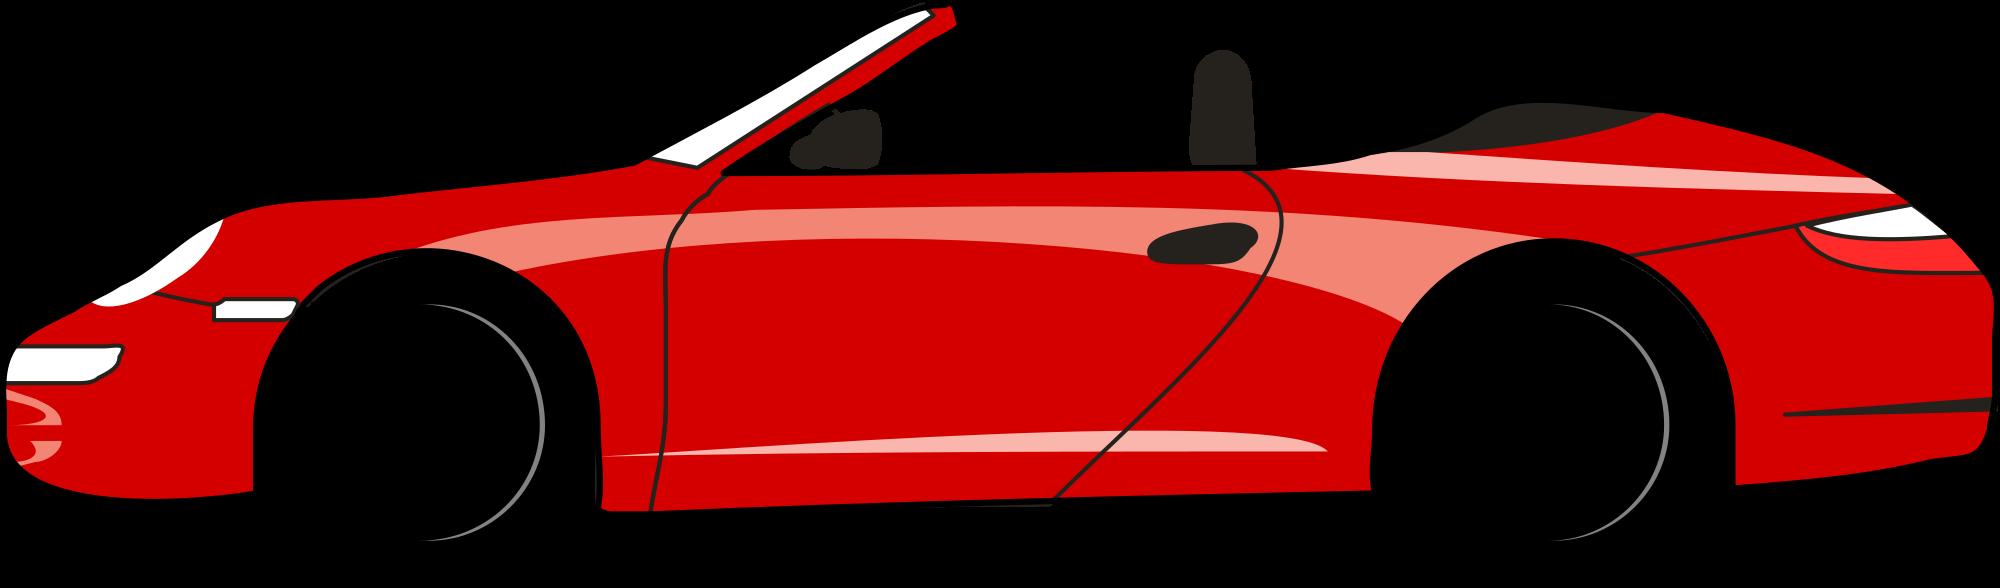 2000x588 Race Car Clipart Side View